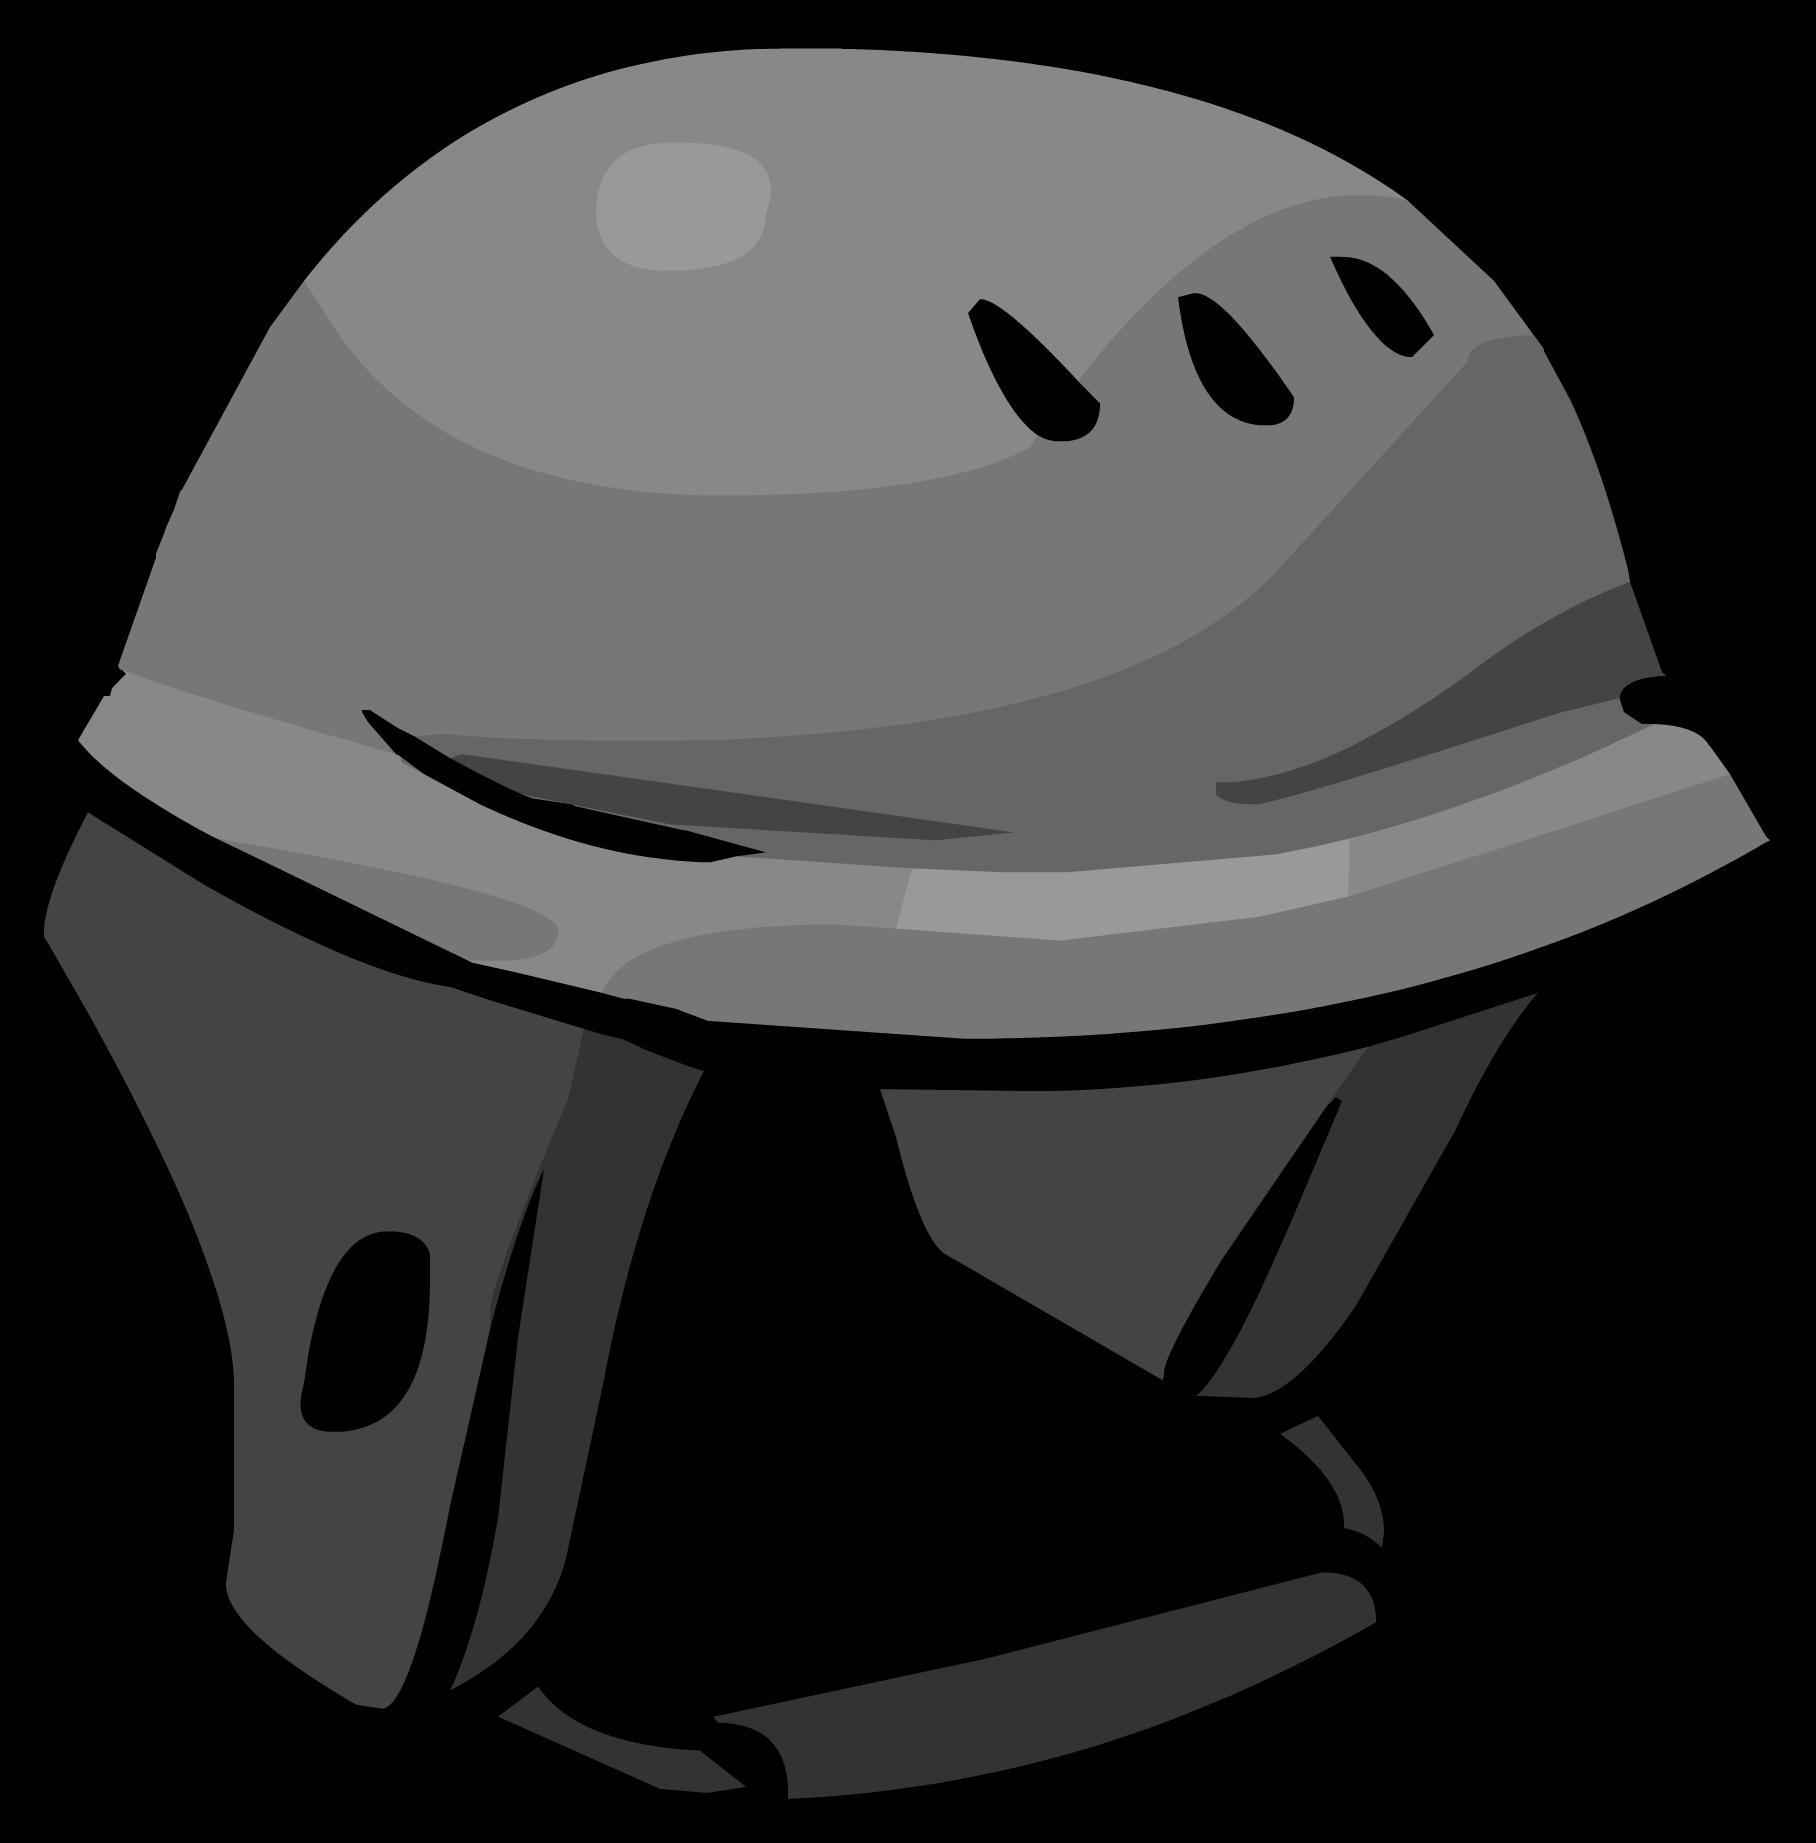 Snowboard Helmet | Club Penguin Rewritten Wiki | Fandom